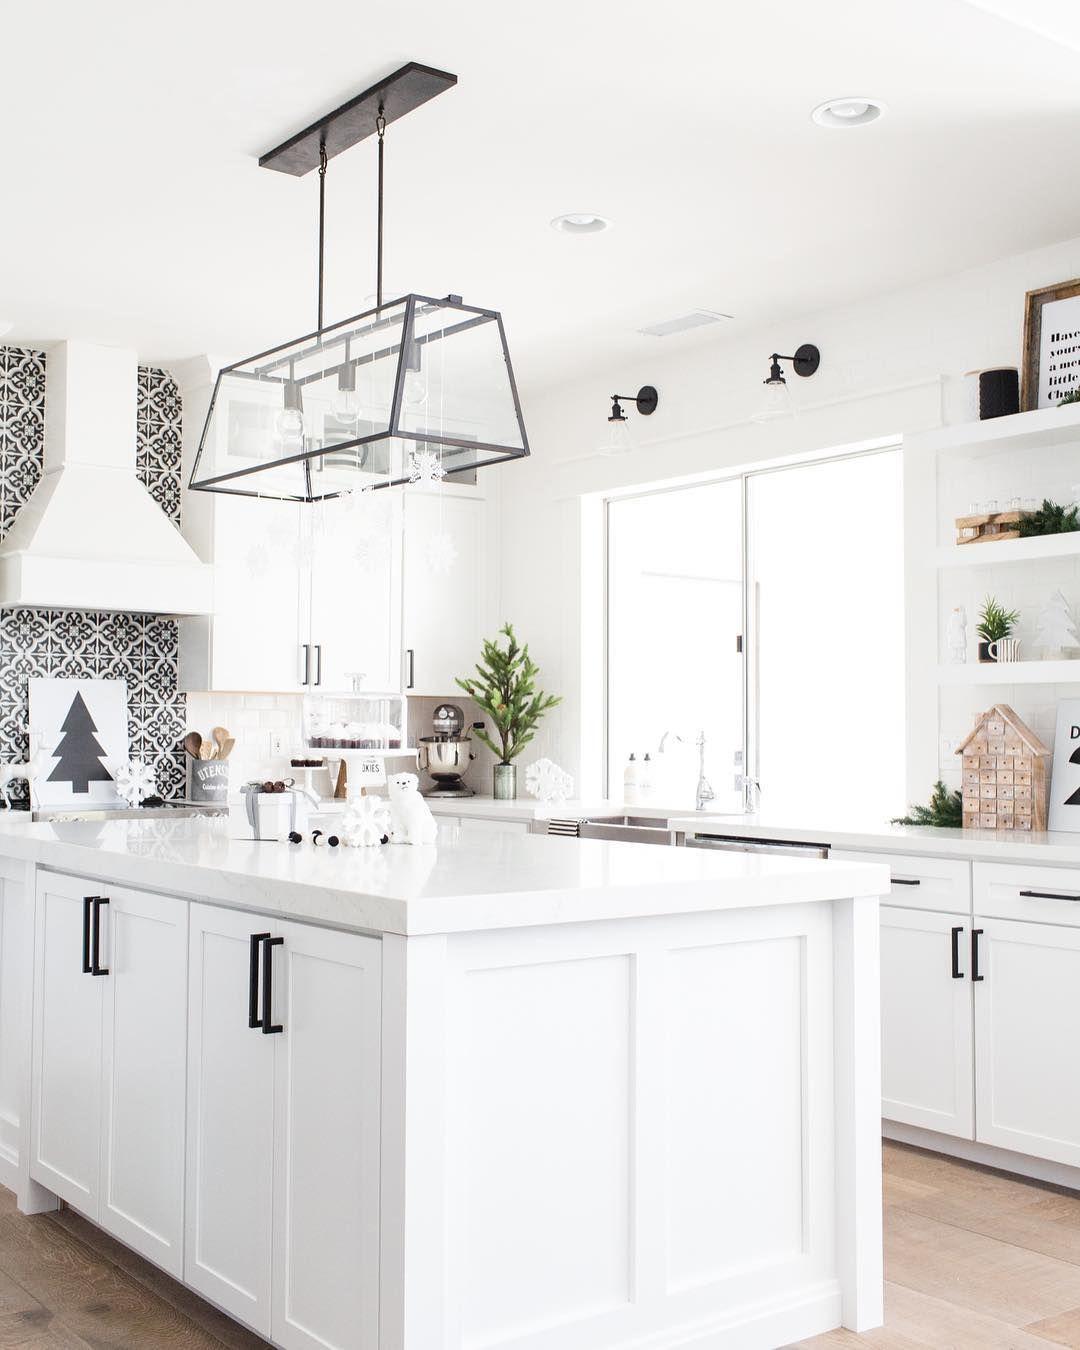 Modern white kitchen with black graphic backsplash and